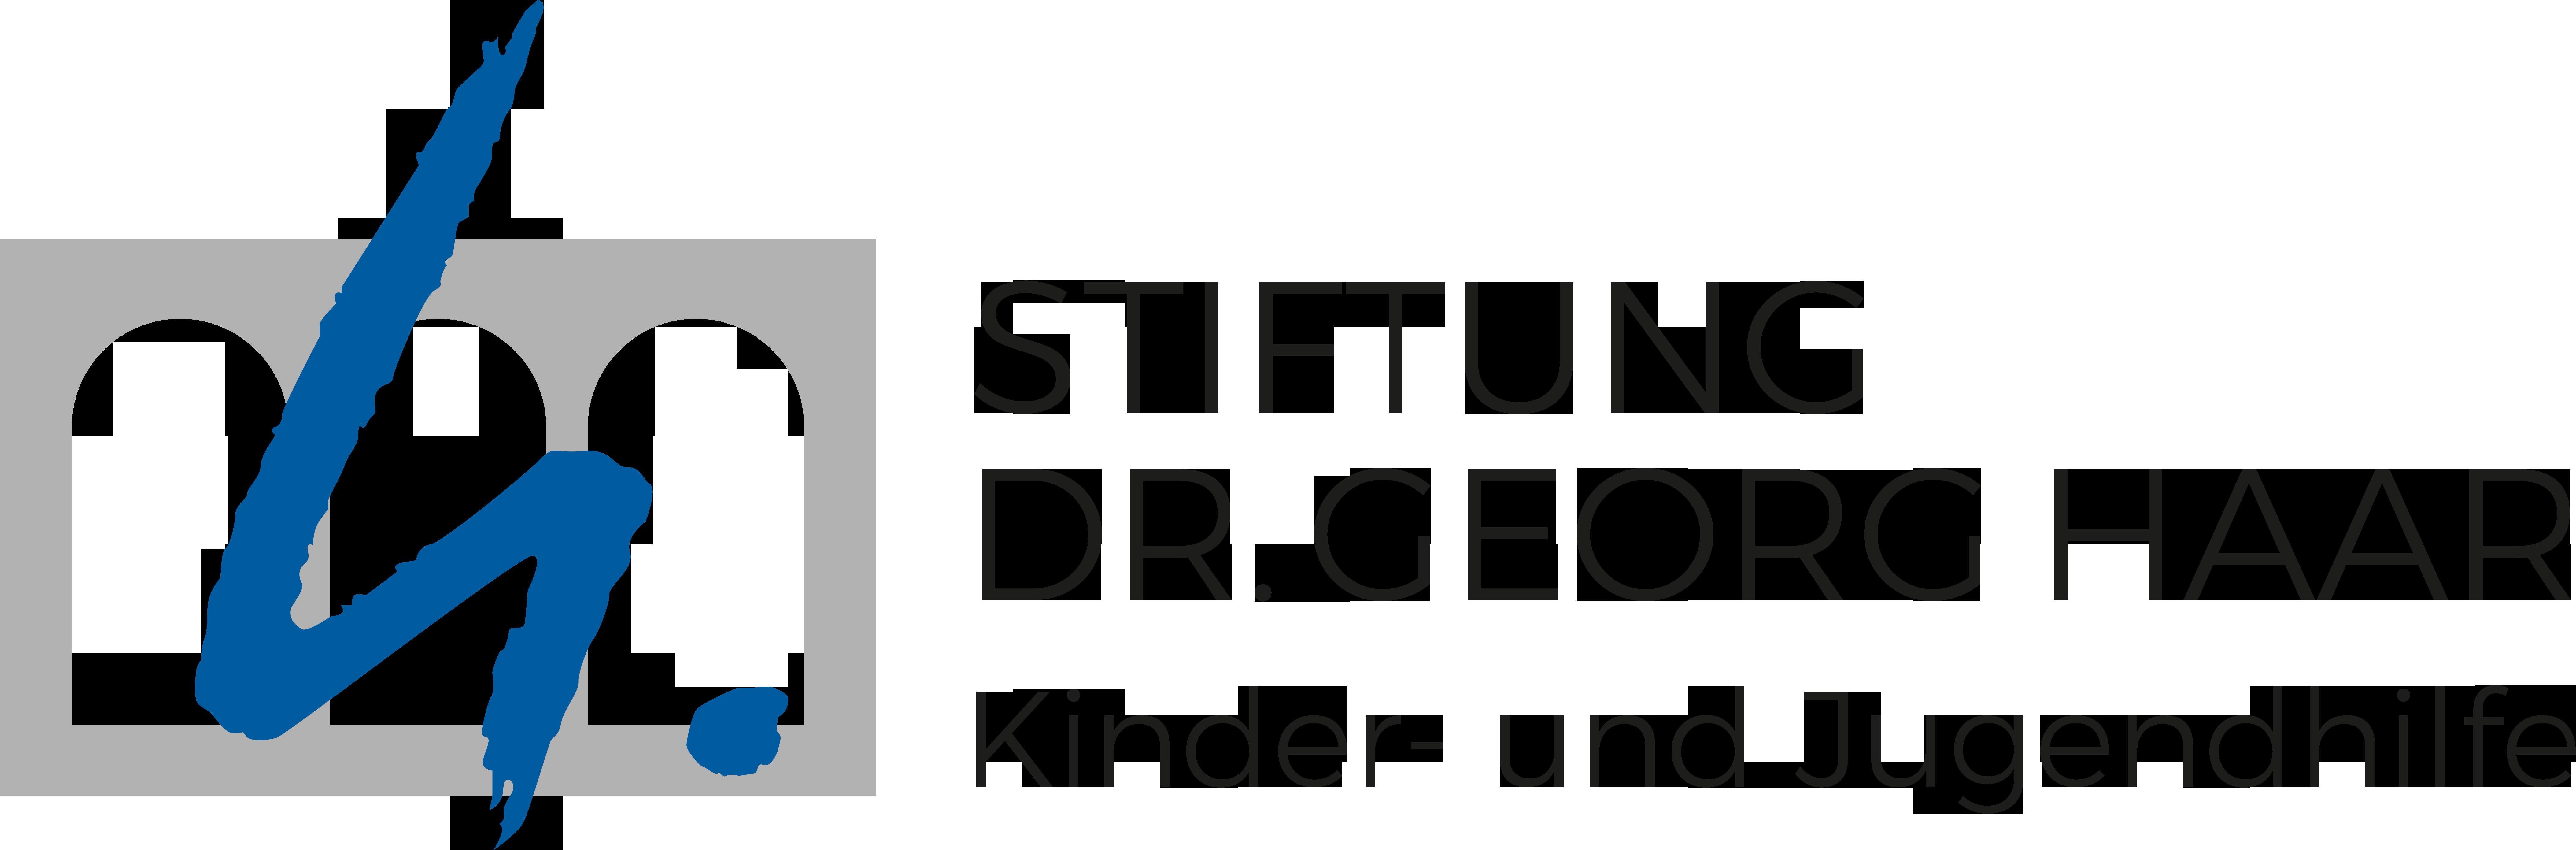 Stiftung Dr. Georg Haar